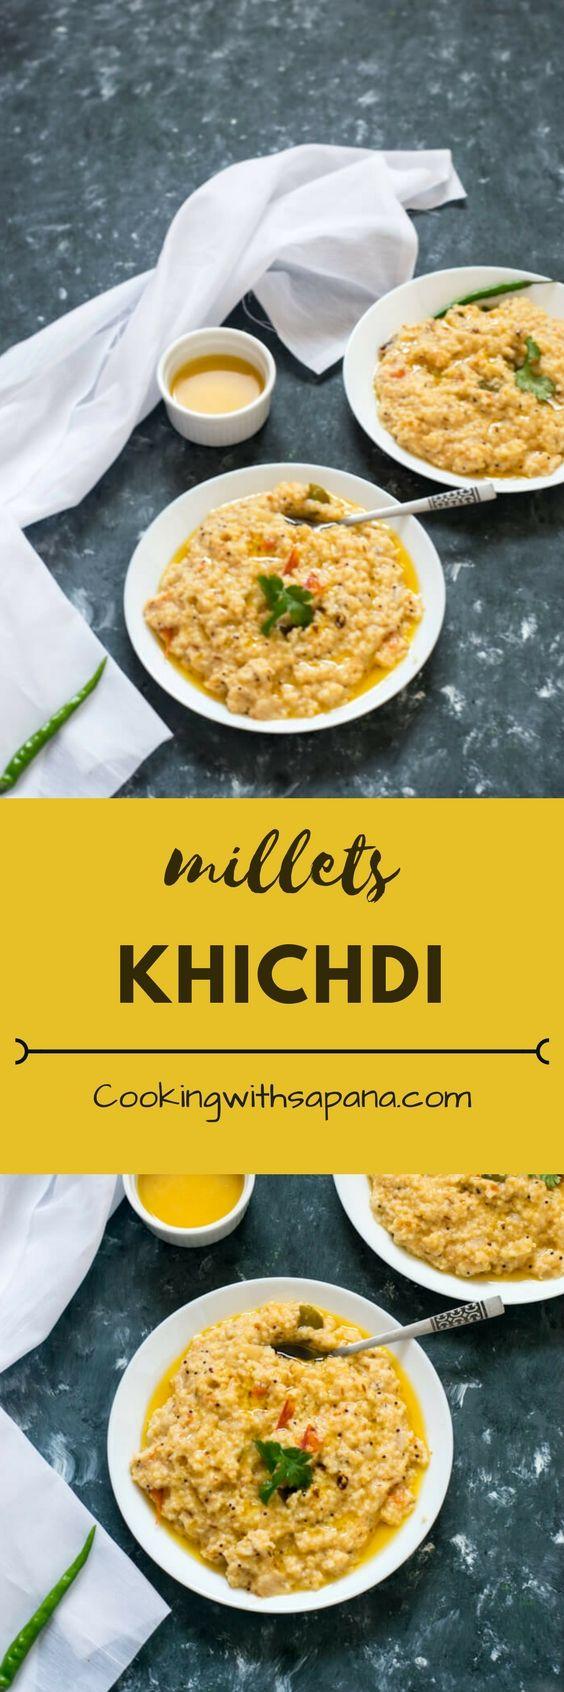 millets khichdi kodo millet khichdi recipe healthy